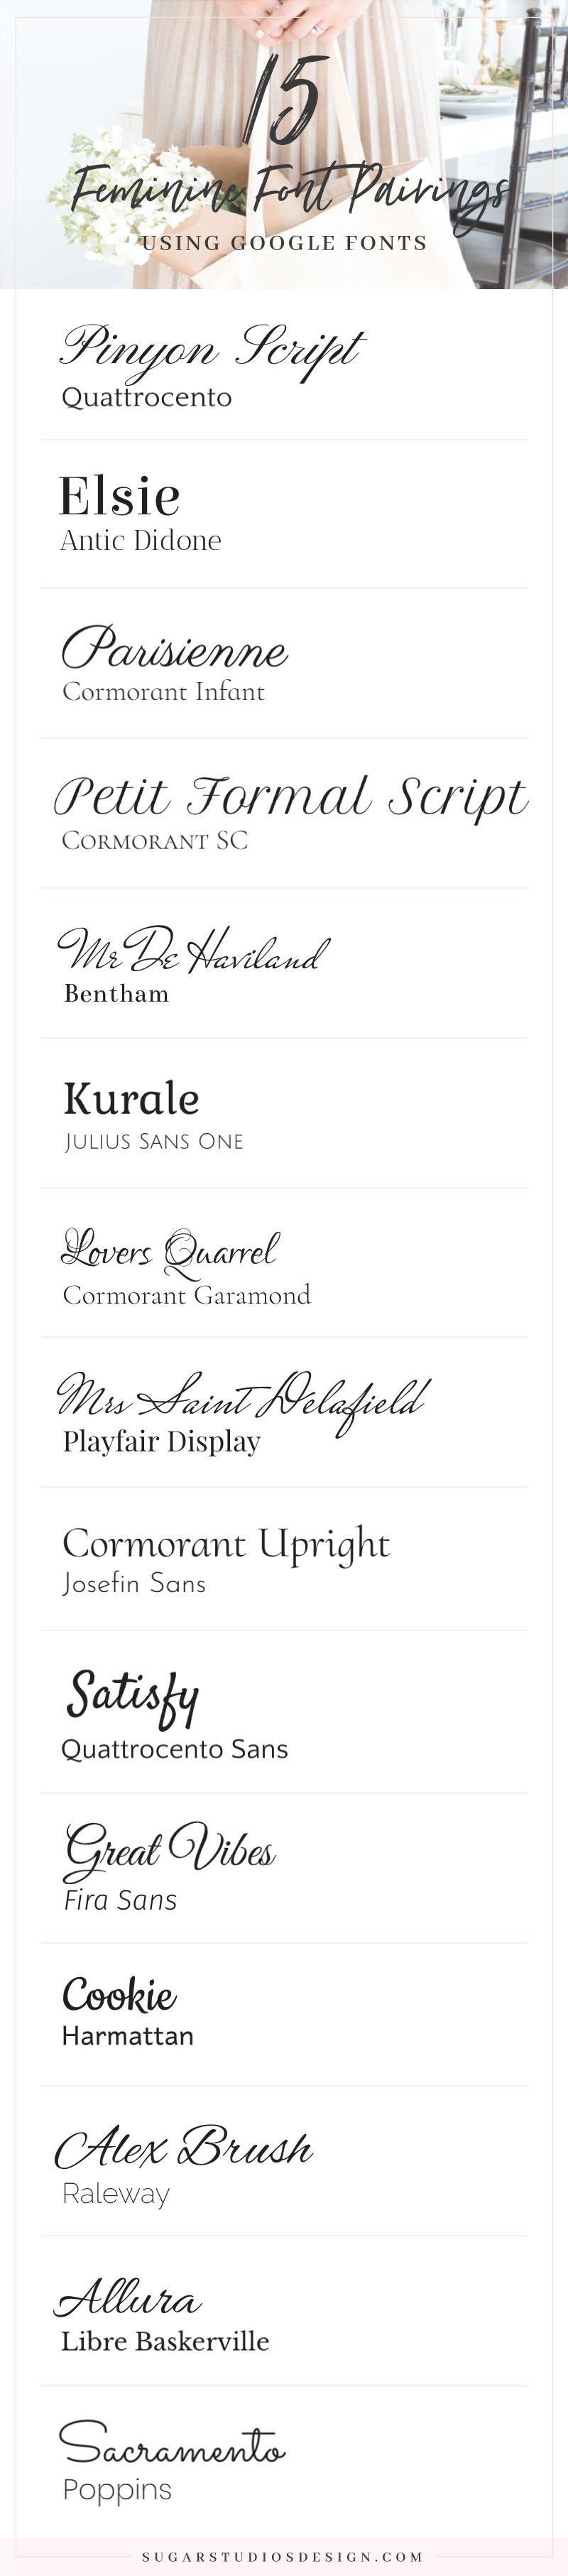 15 Feminine Google Font Pairings Free Google Font Pairings Girly Fonts Google Fonts